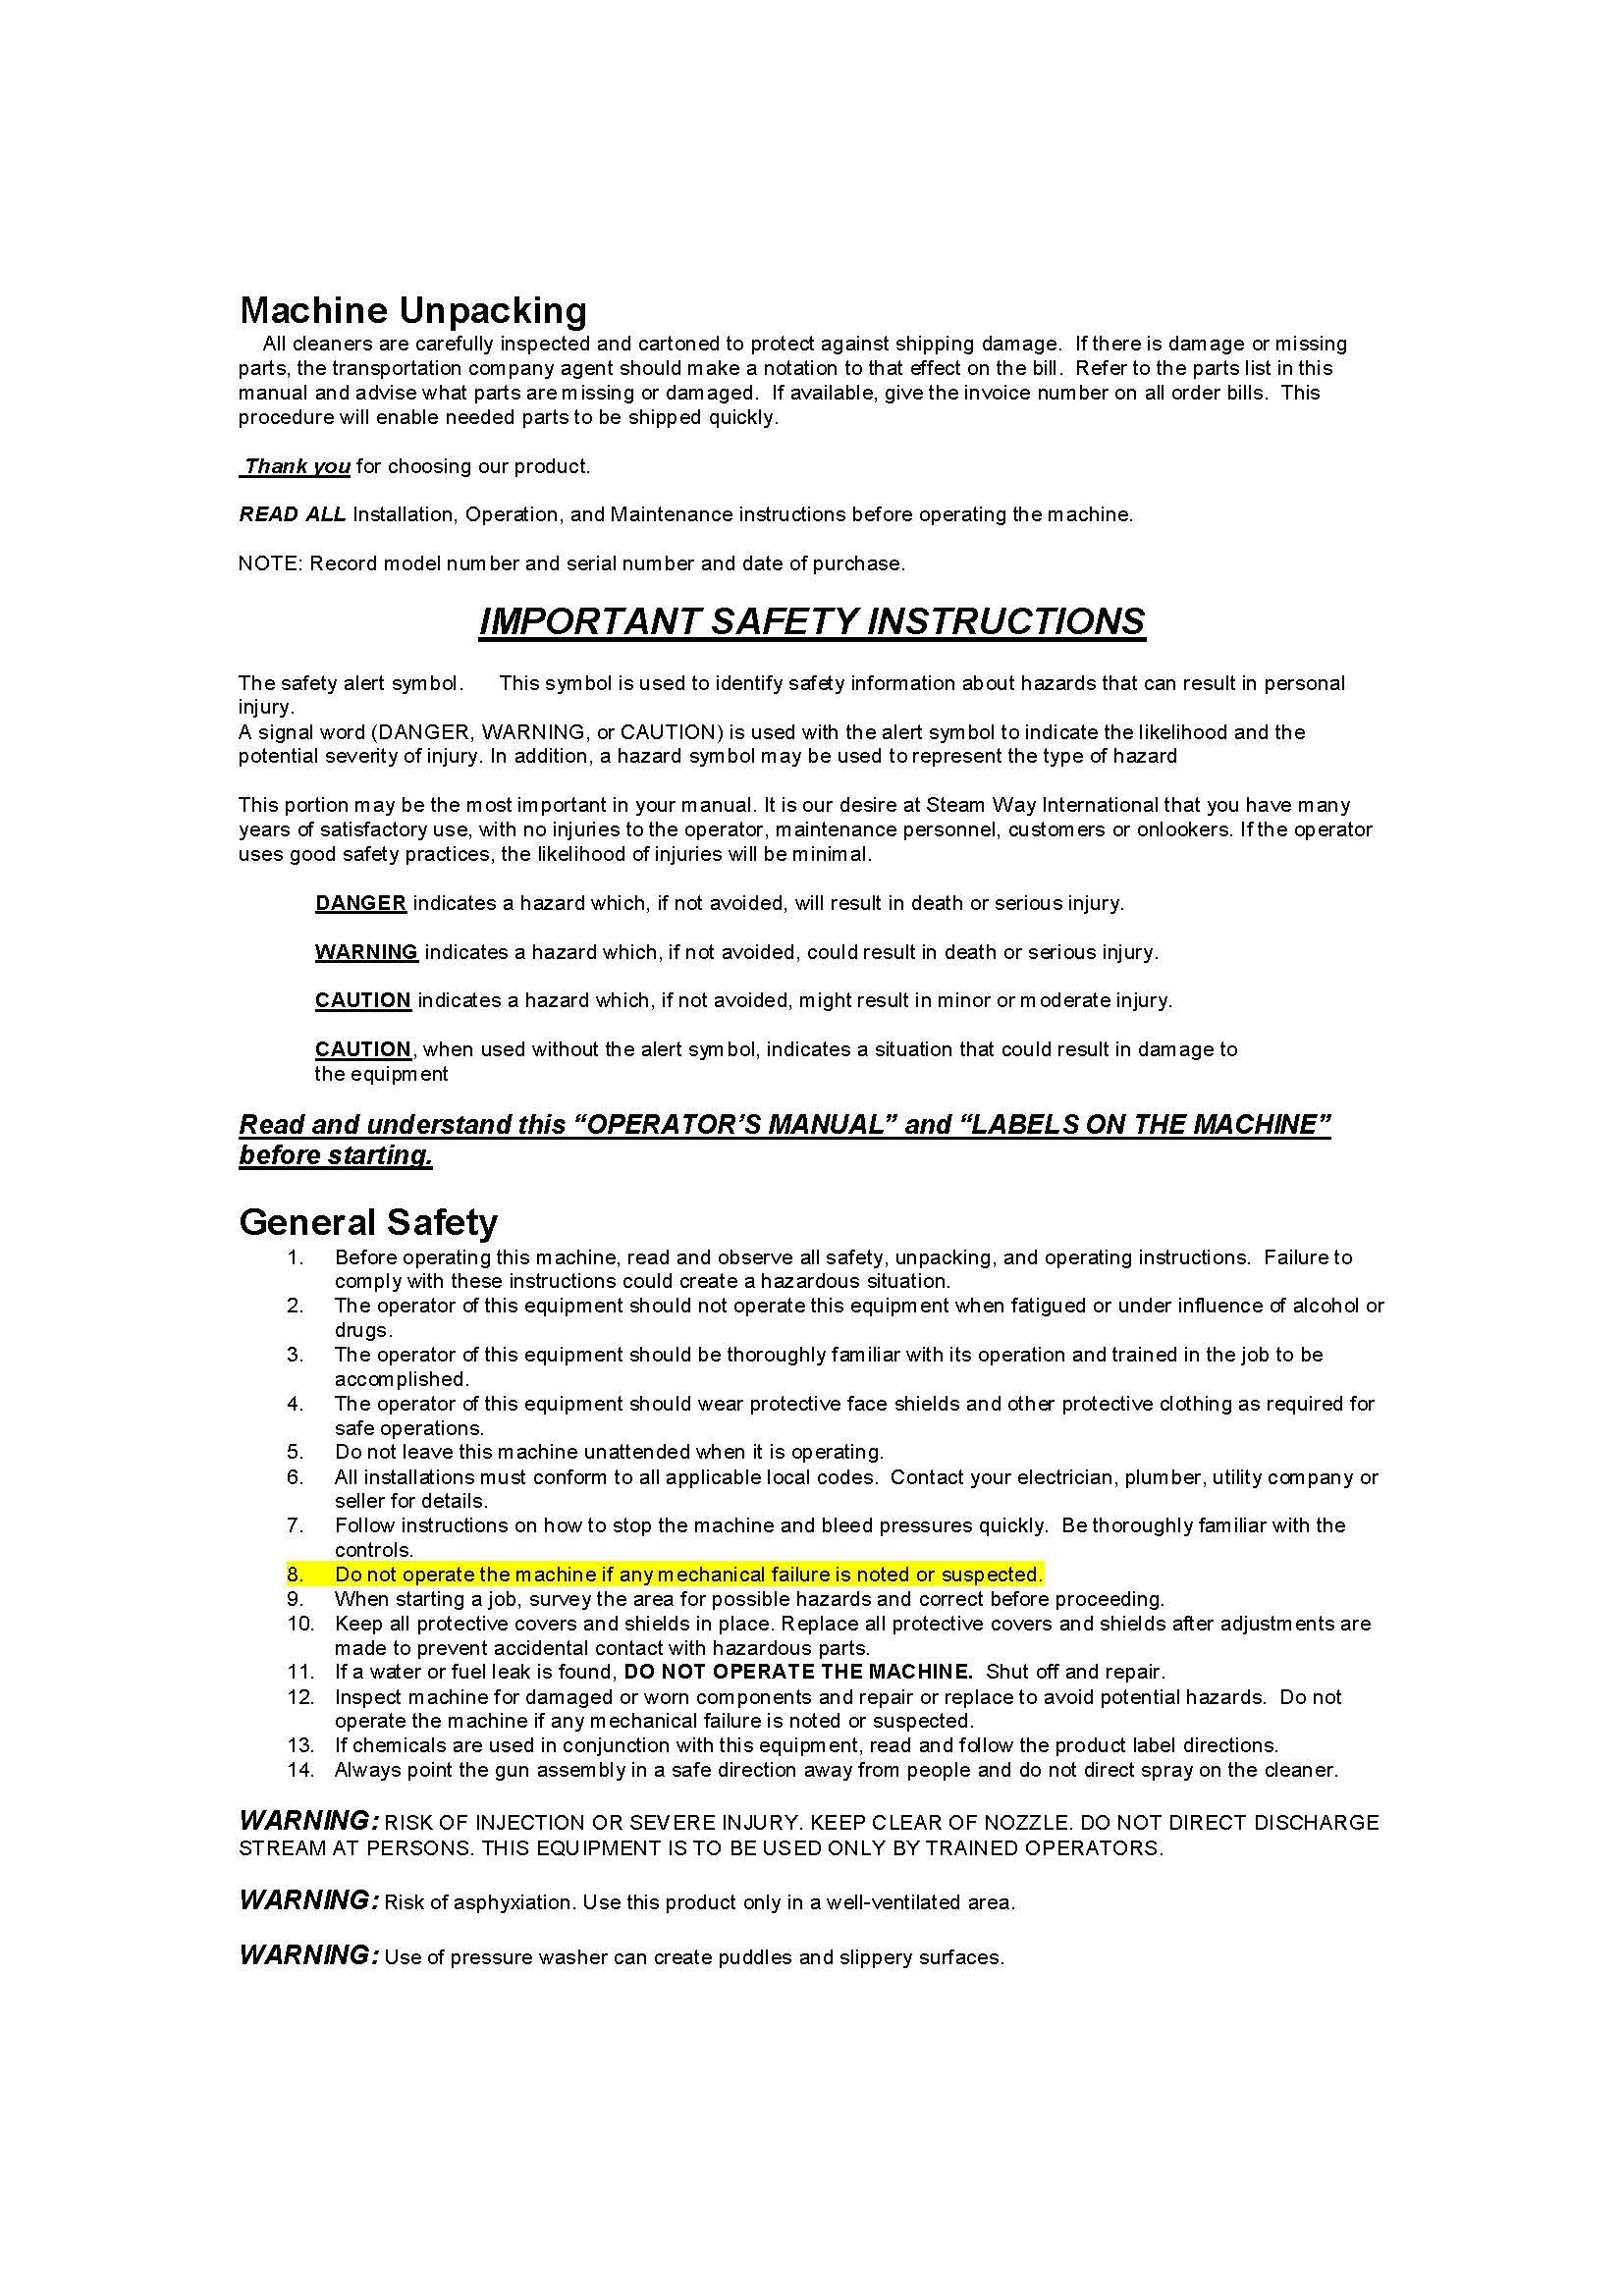 technical translation samples toronto translated document translated file 1 translated file 2 translated file 3 machine operator s manual translation sample